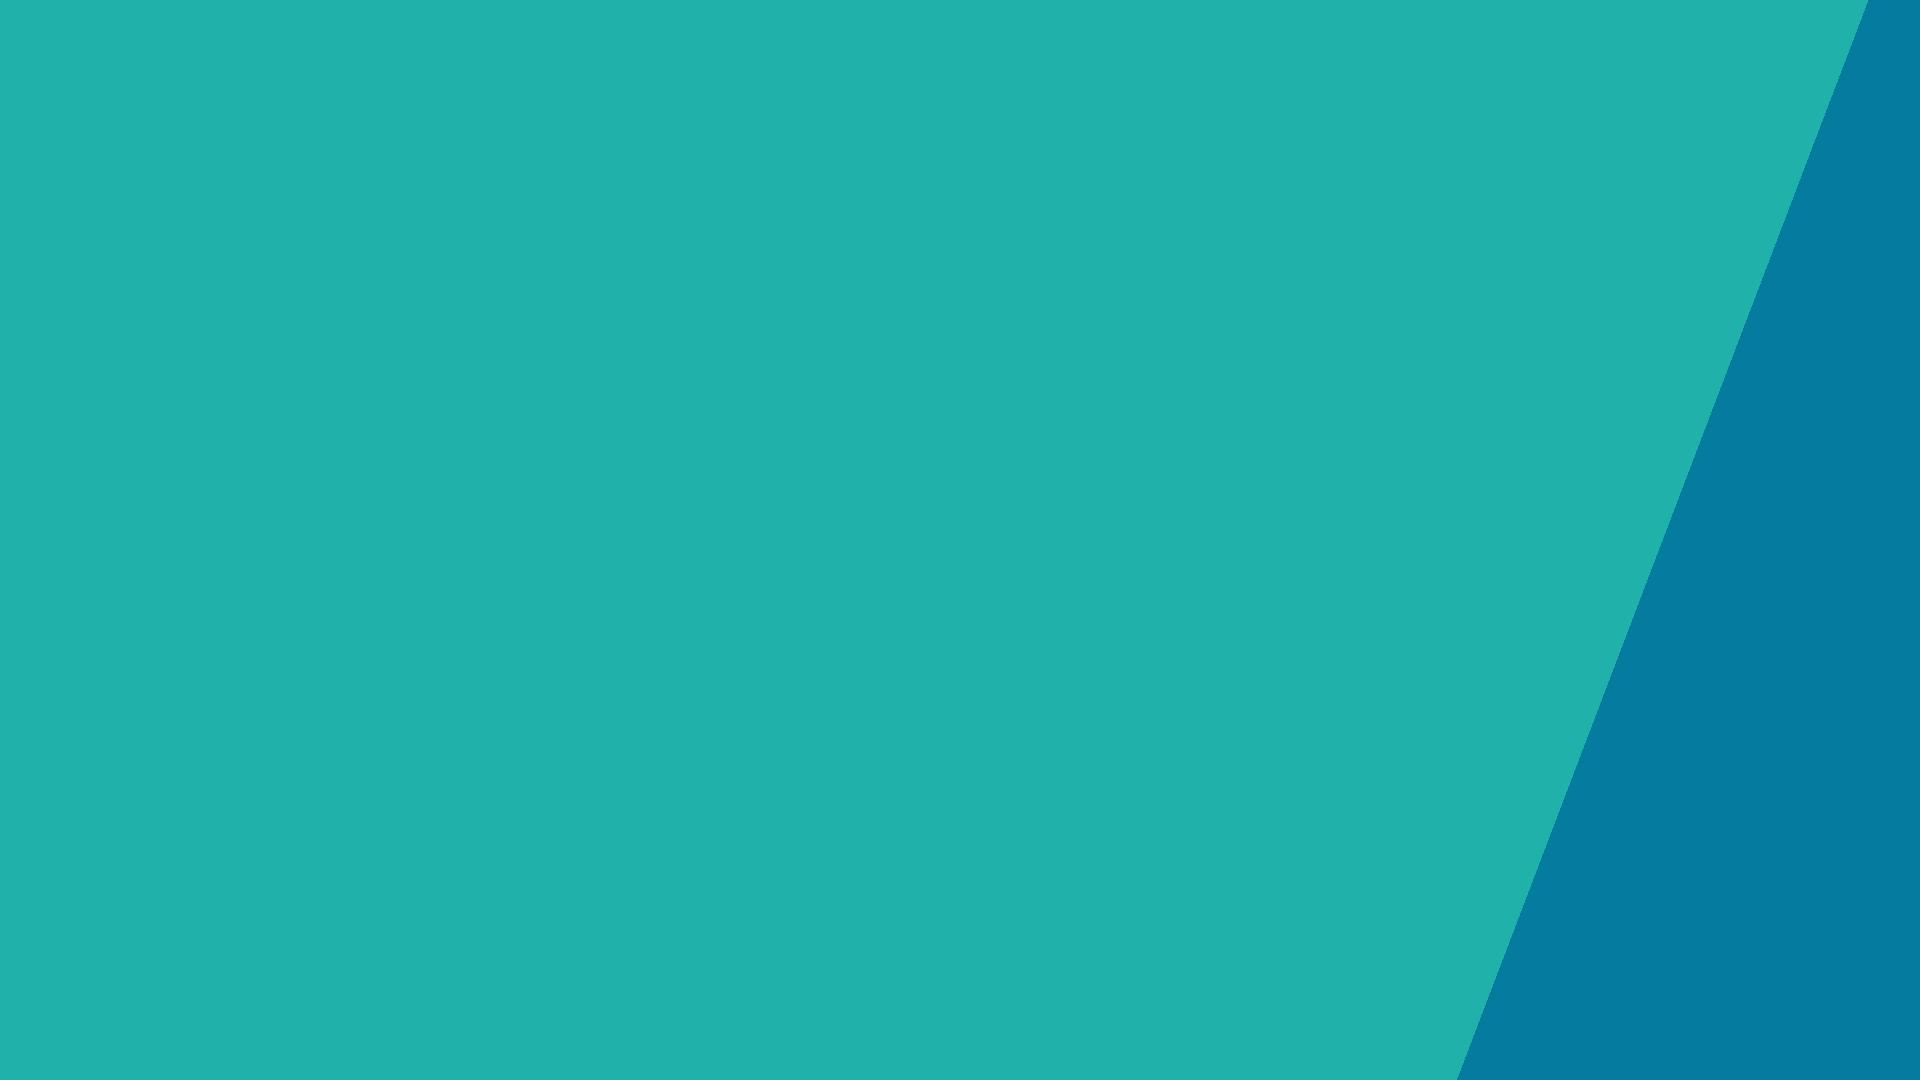 Turquoise Blue Gradient